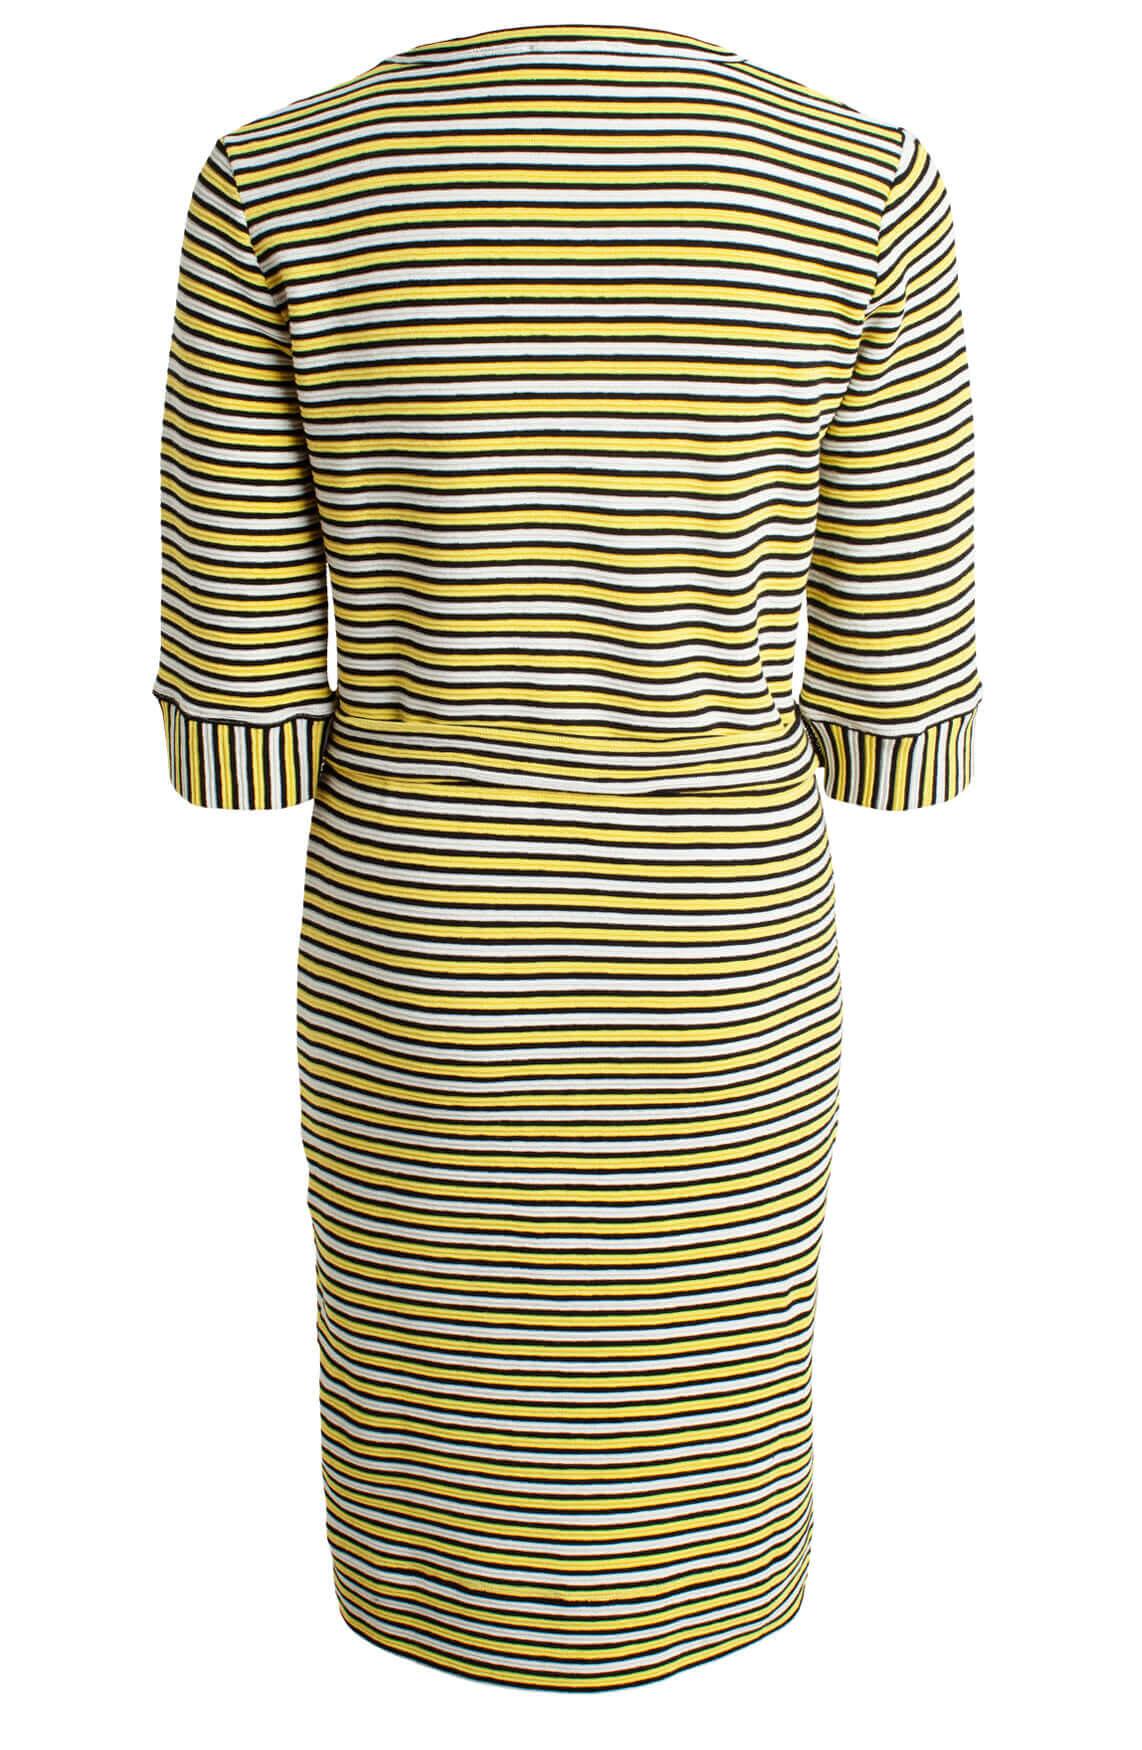 Anna Dames Gestreepte jurk geel